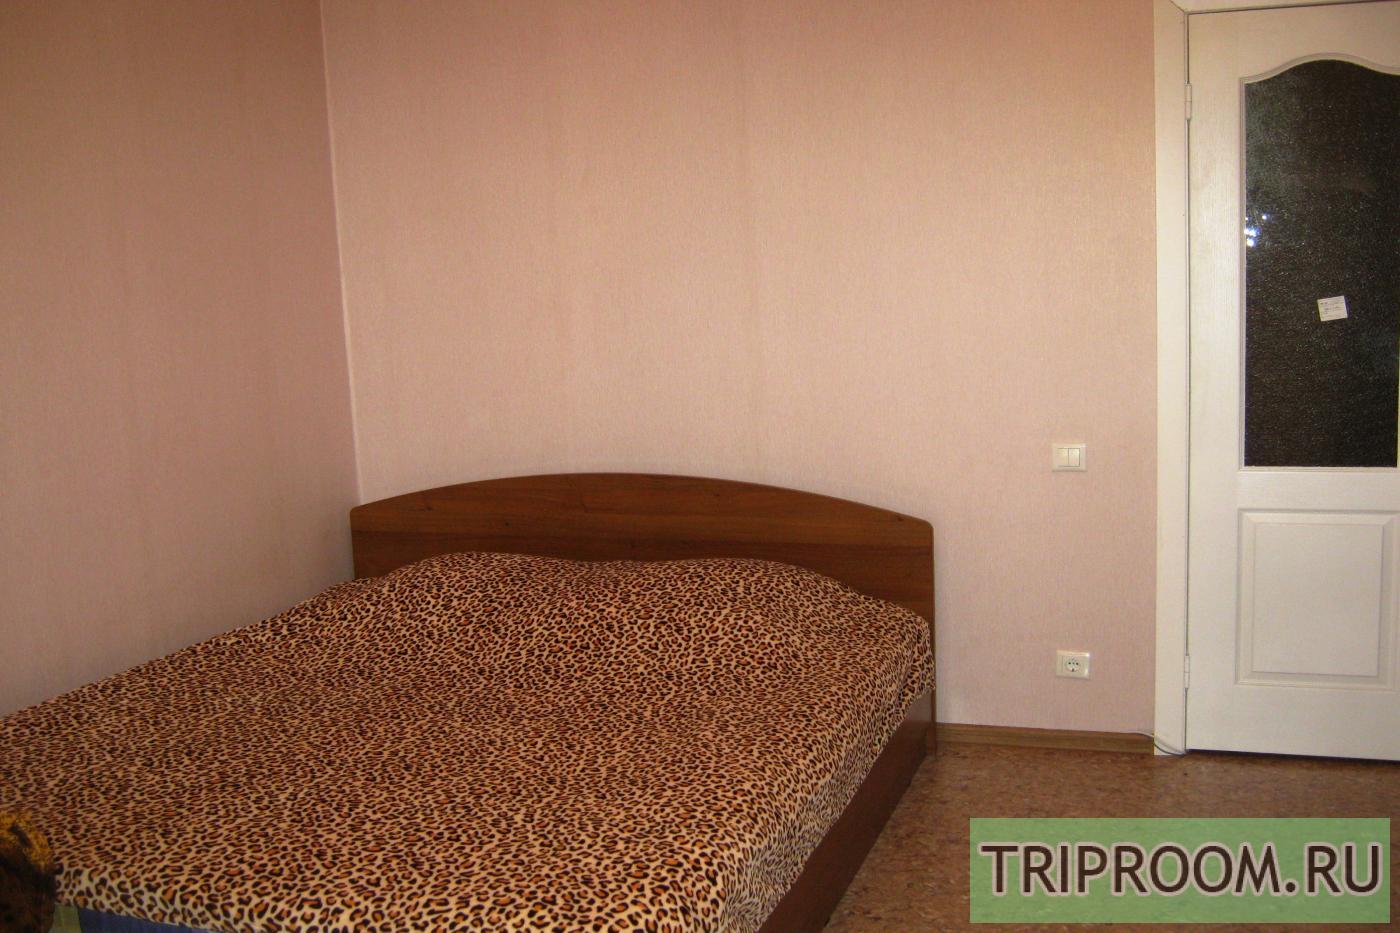 1-комнатная квартира посуточно (вариант № 5895), ул. Алексеева улица, фото № 3